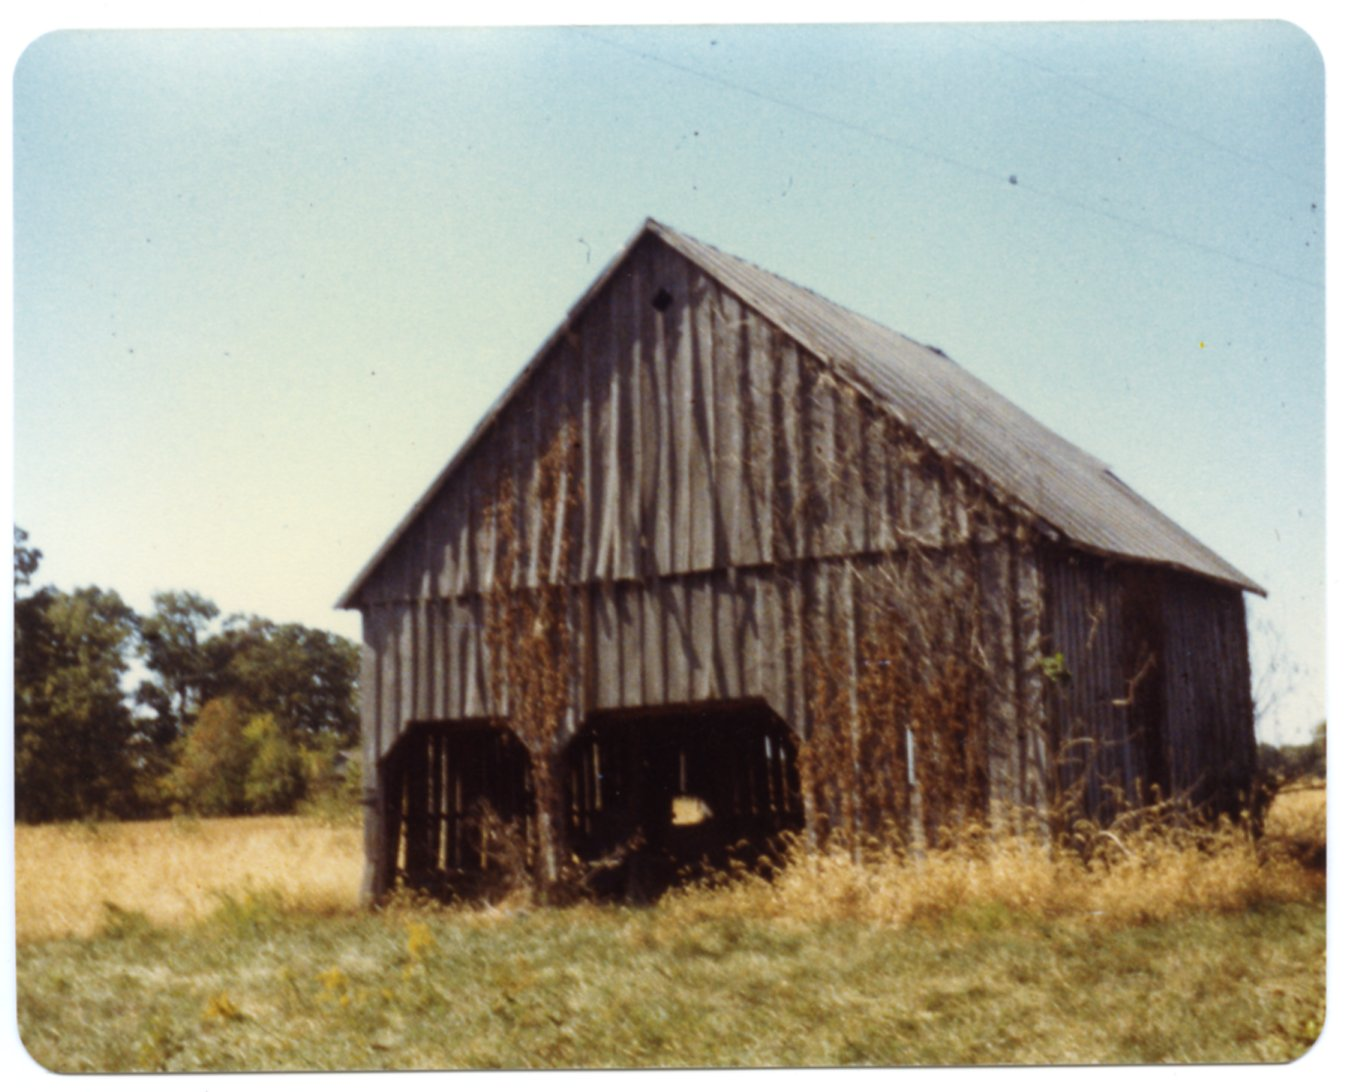 Barn on Guy Throgmorton Farm